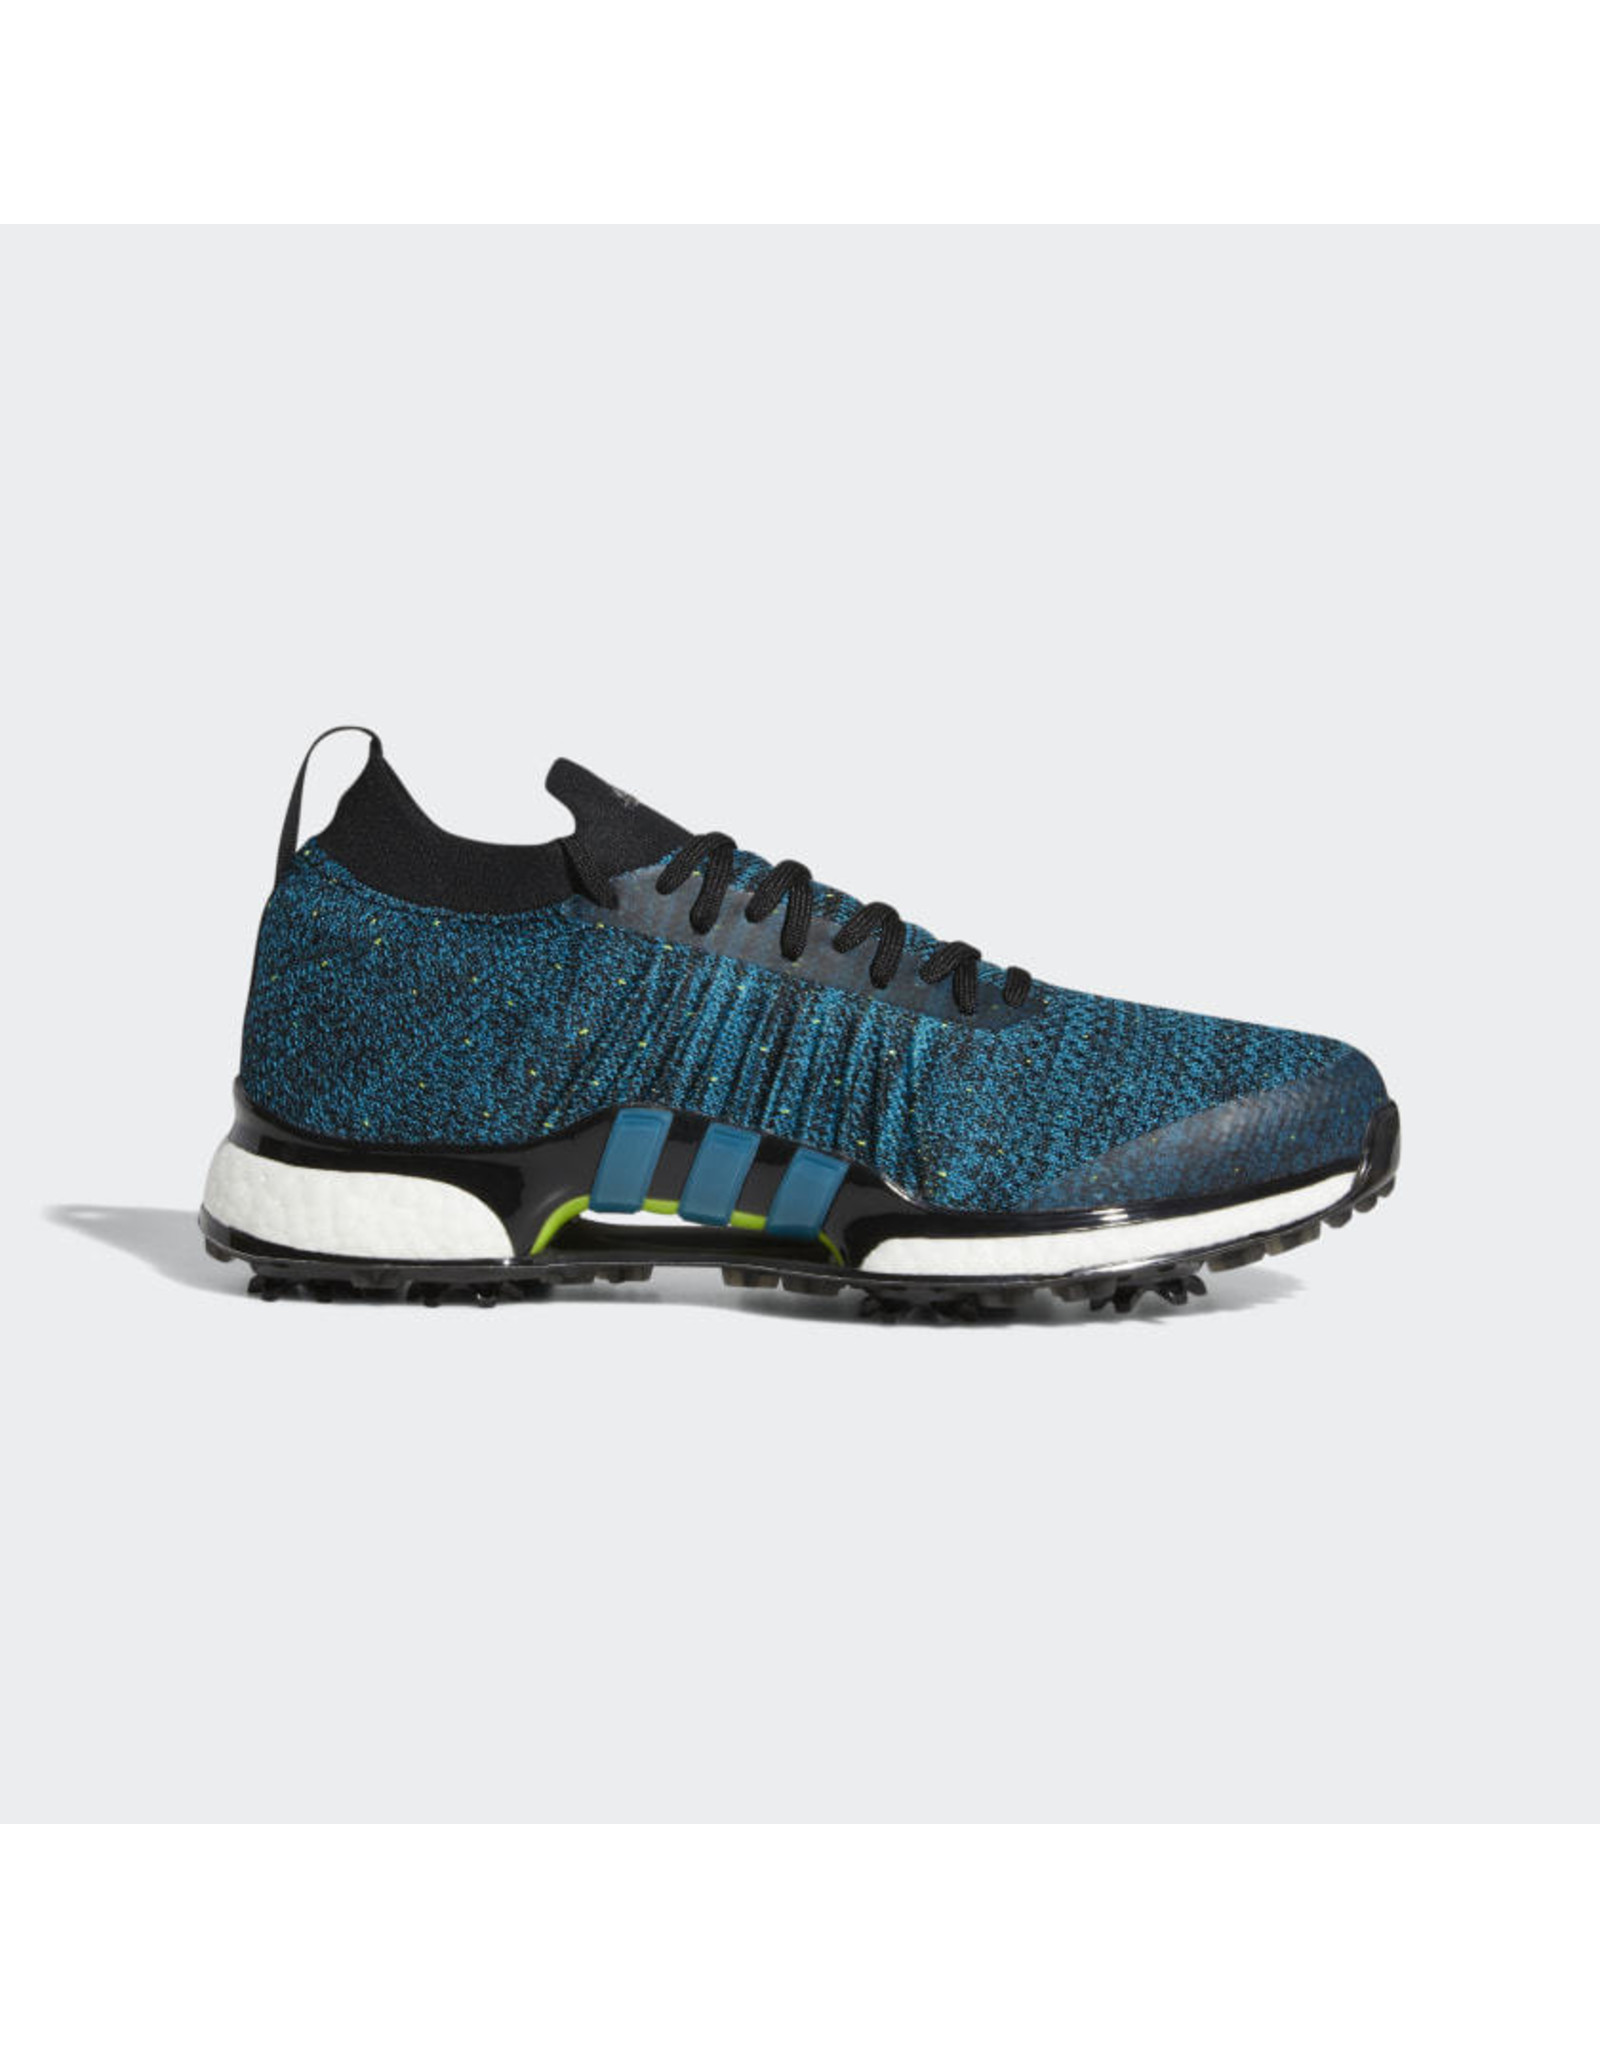 Adidas Adidas TOUR360 XT Primeknit Blue